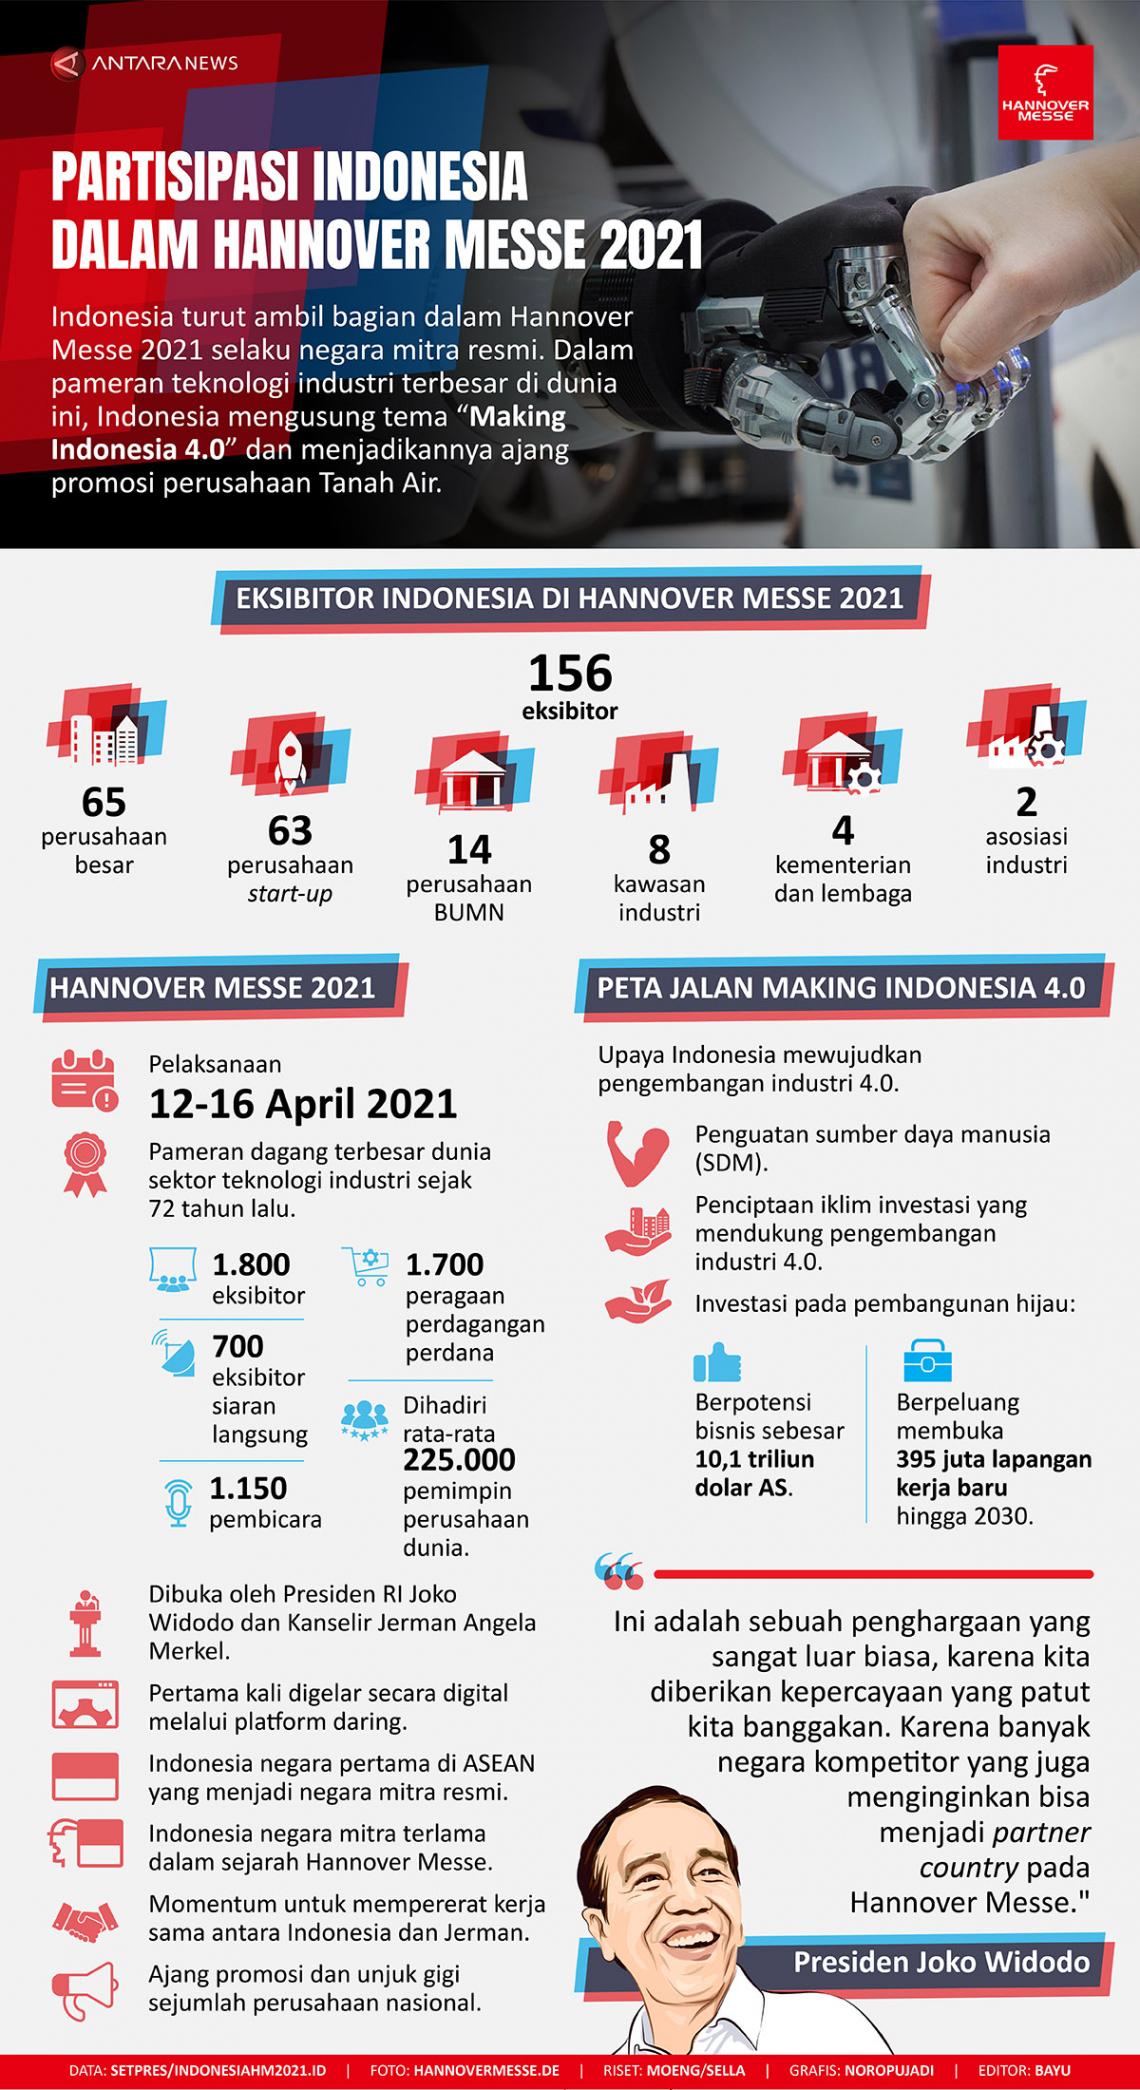 Partisipasi Indonesia dalam Hannover Messe 2021